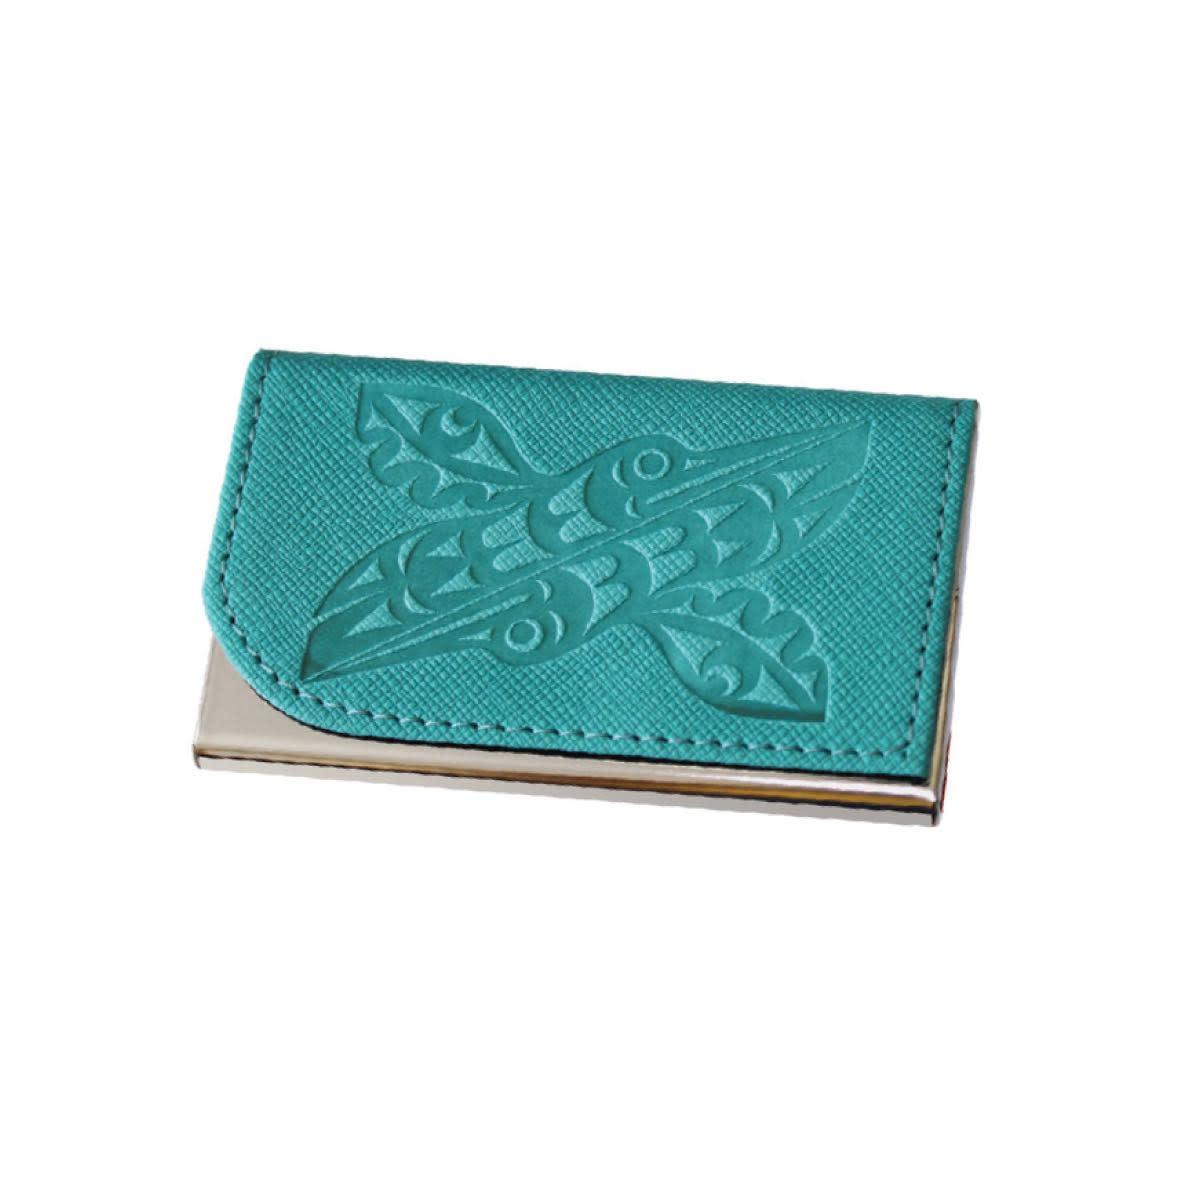 Business Card Holder-1